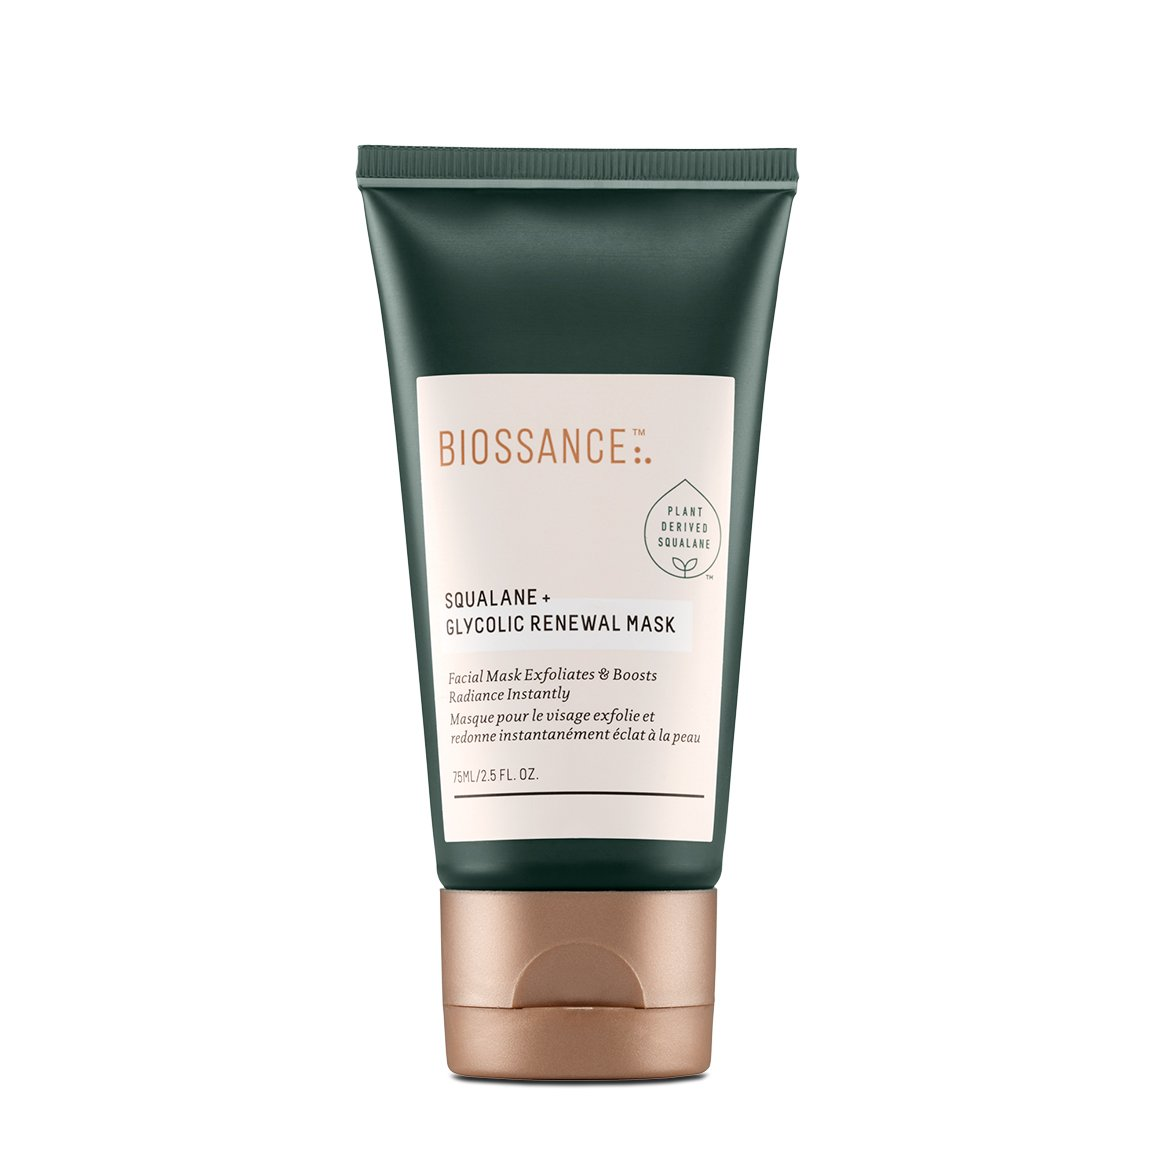 Biossance Squalane + Glycolic Renewal Facial Mask